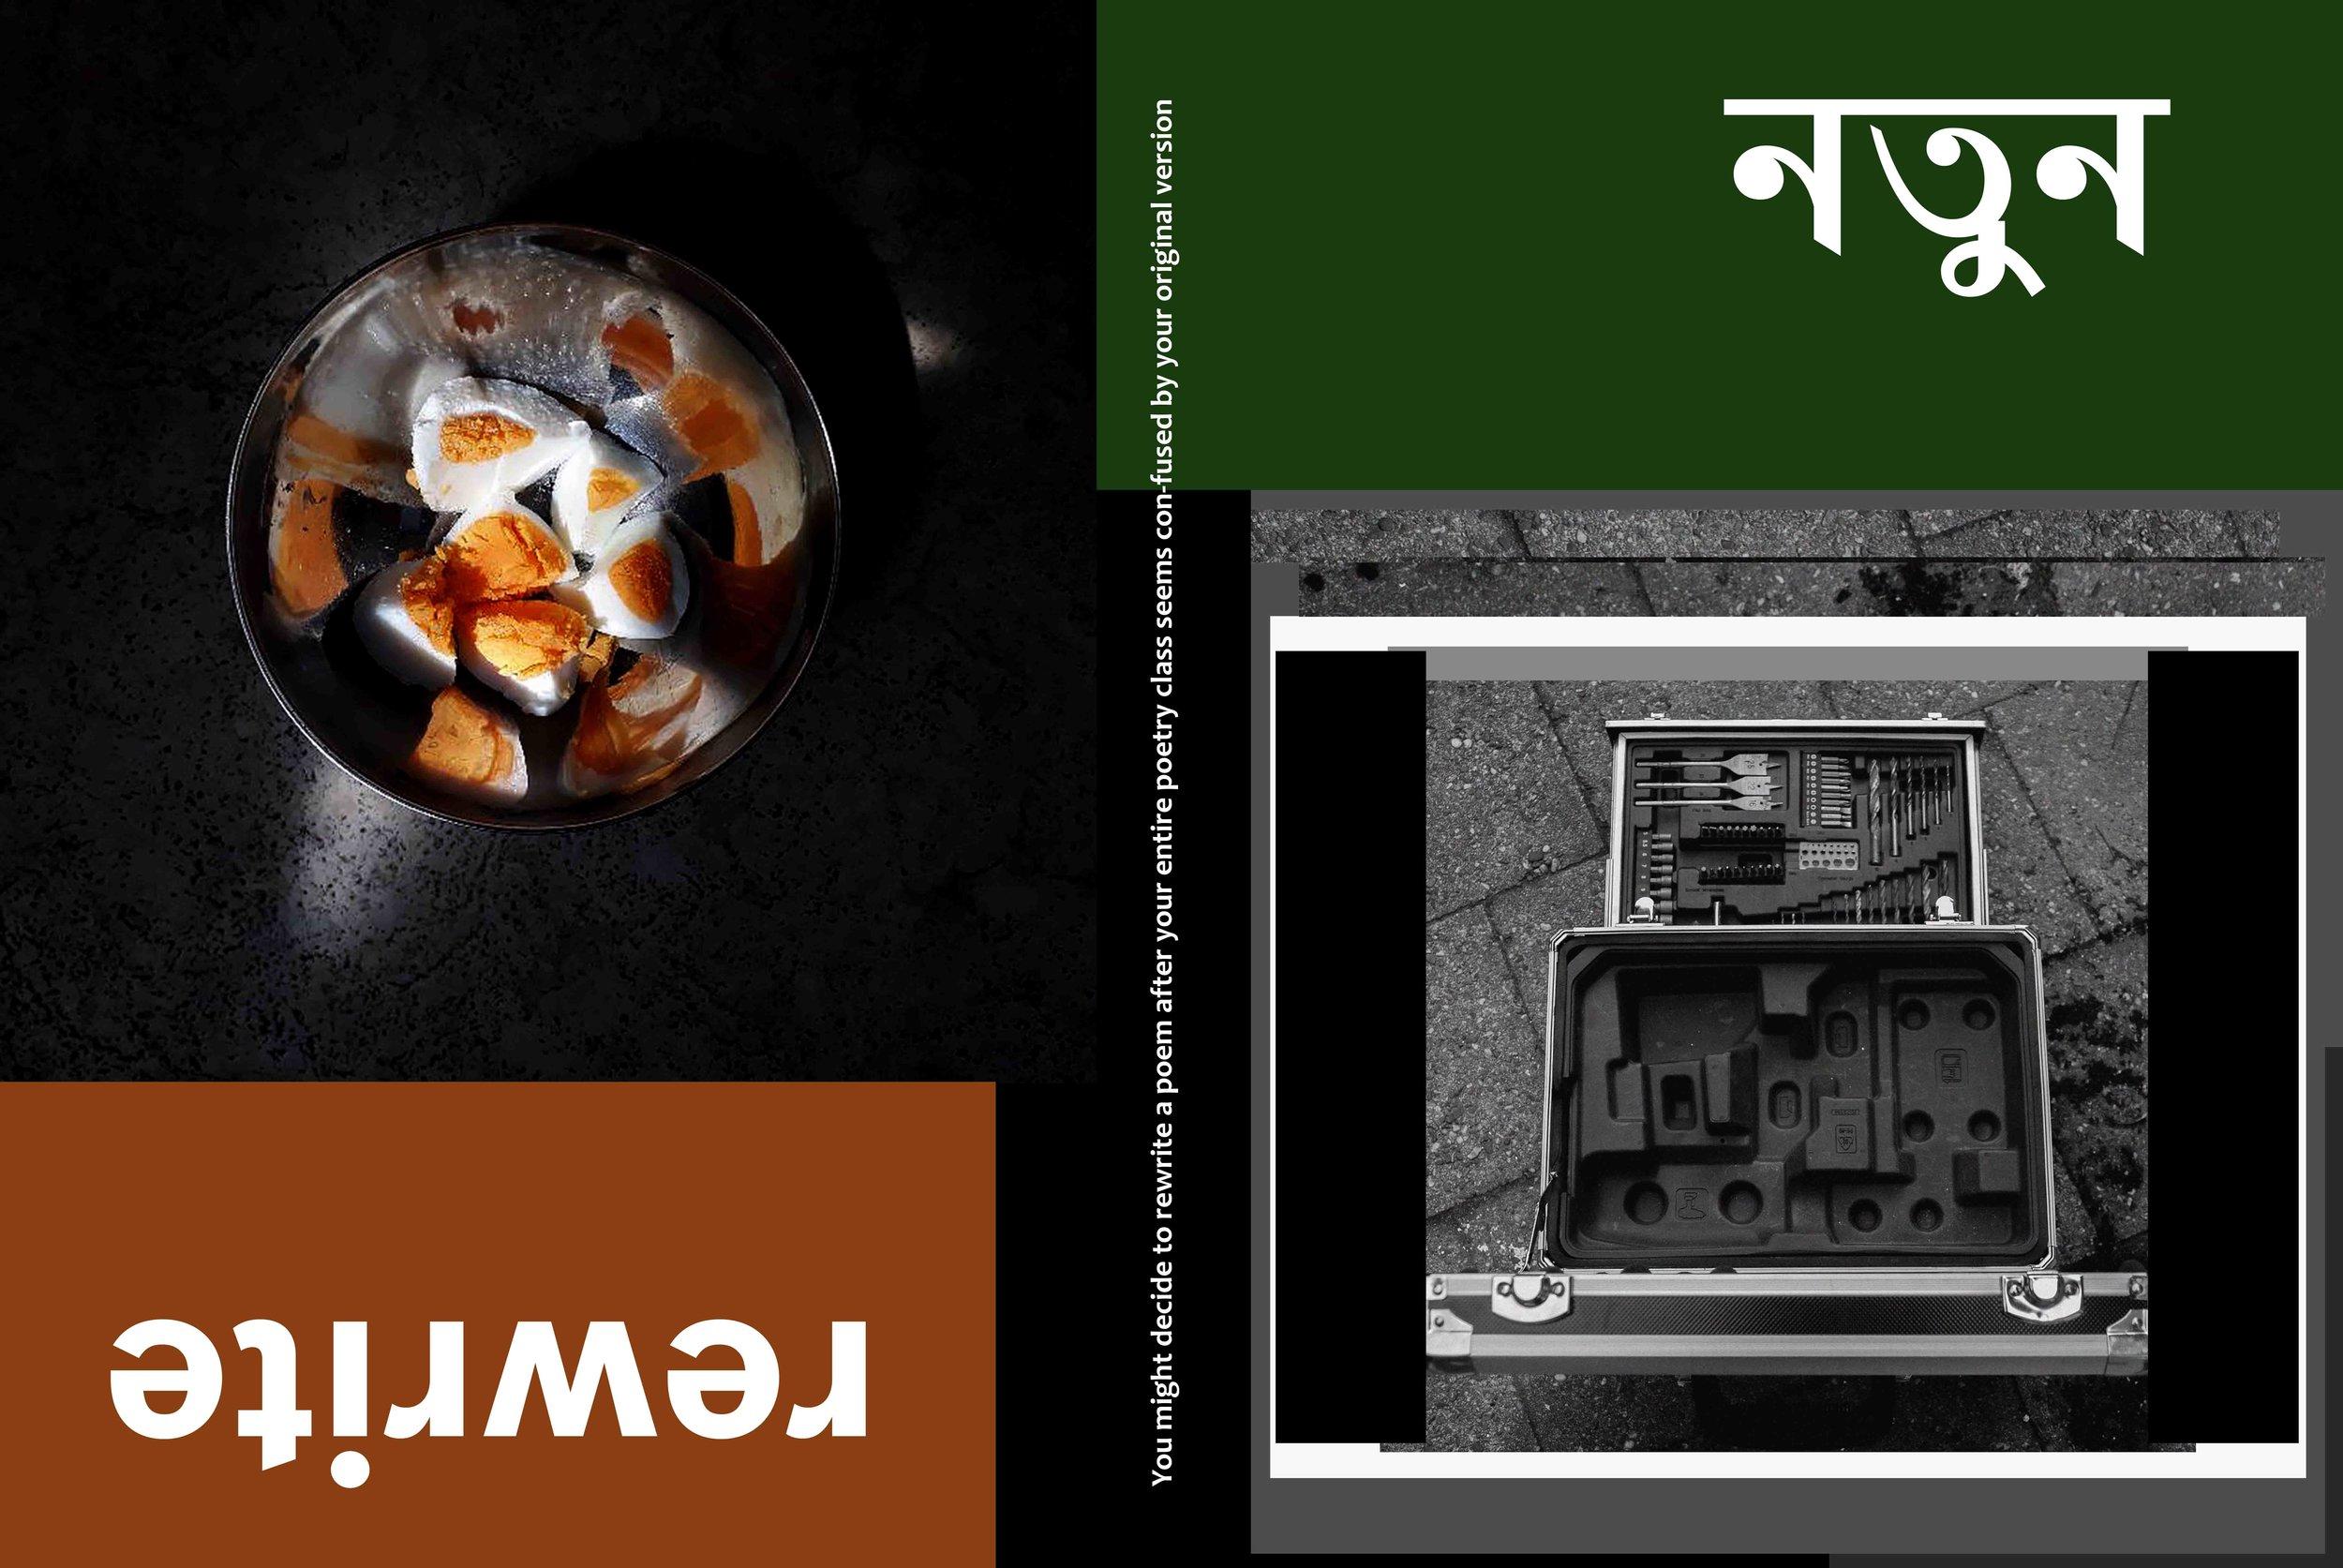 REWRITE / dvd cover / 18.2 cm x 27.2 cm / 2019  by Rini Swarnaly Mitra und Shuvo Rafiqul